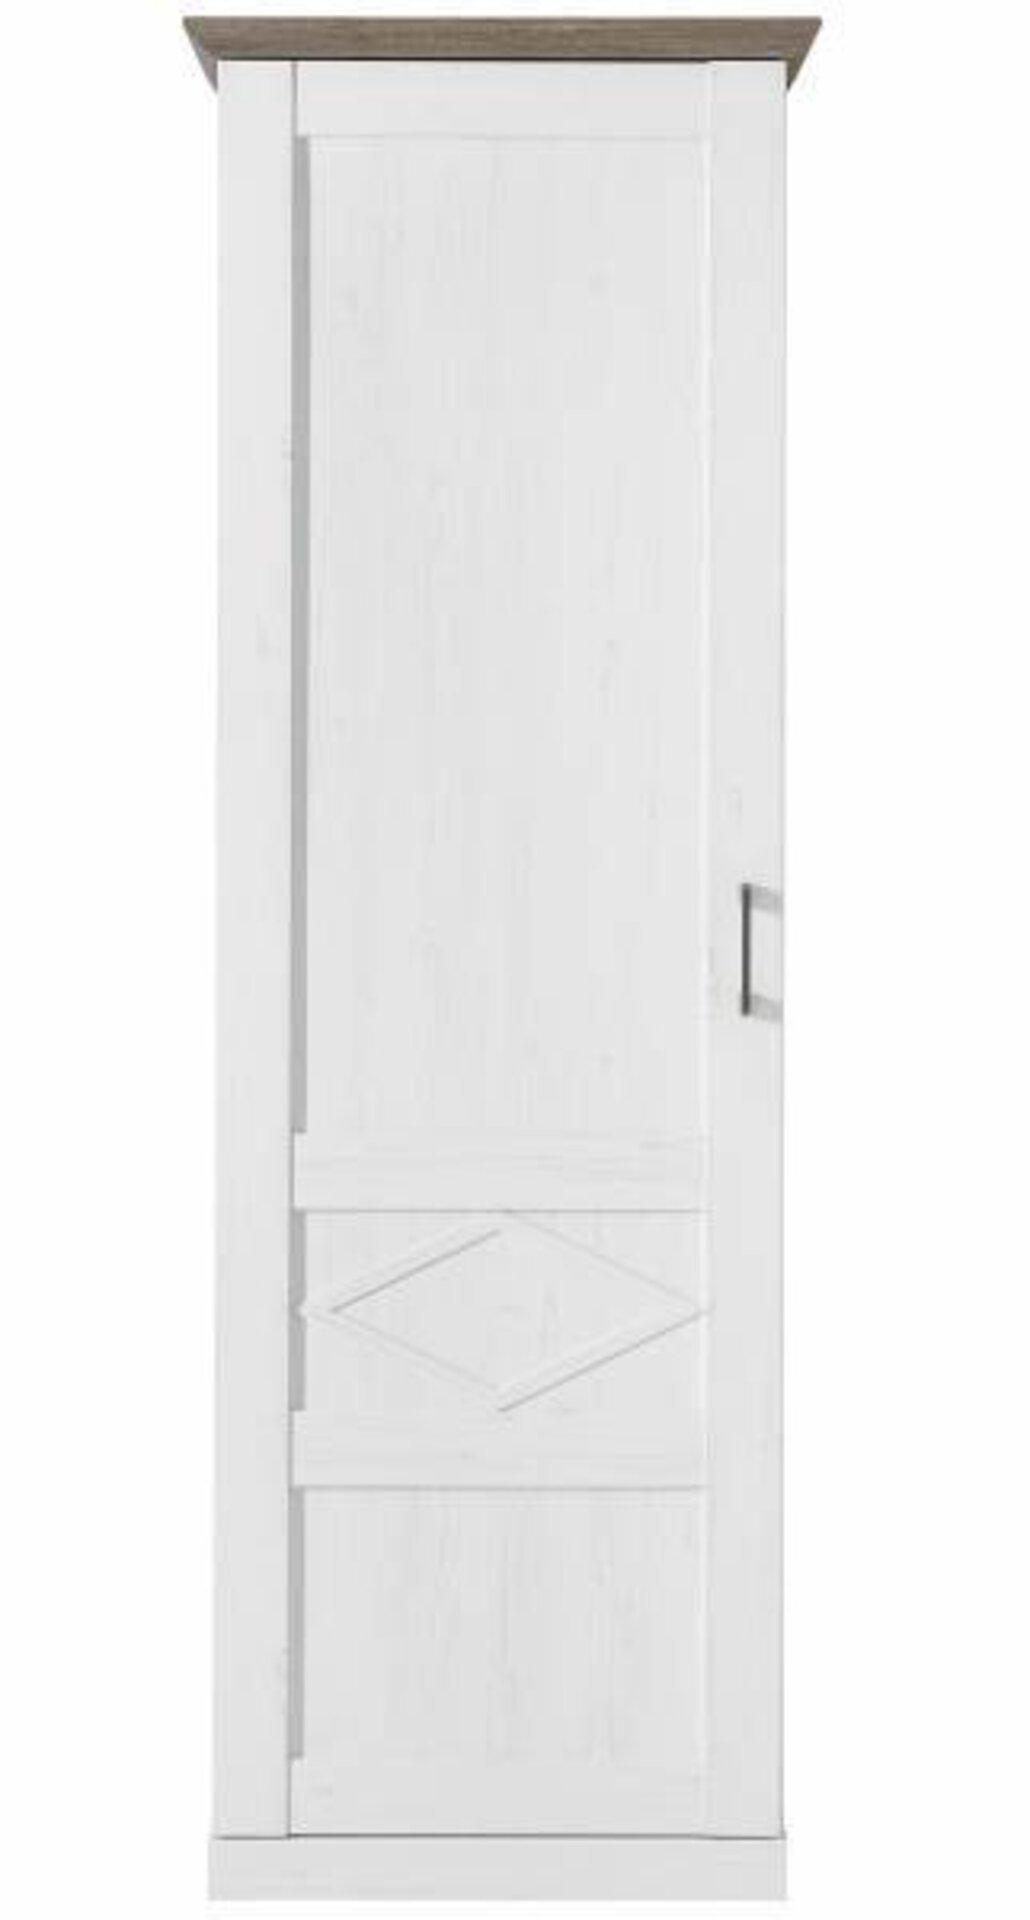 Garderobenschrank COUNTRY Vito Holzwerkstoff braun 42 x 200 x 68 cm